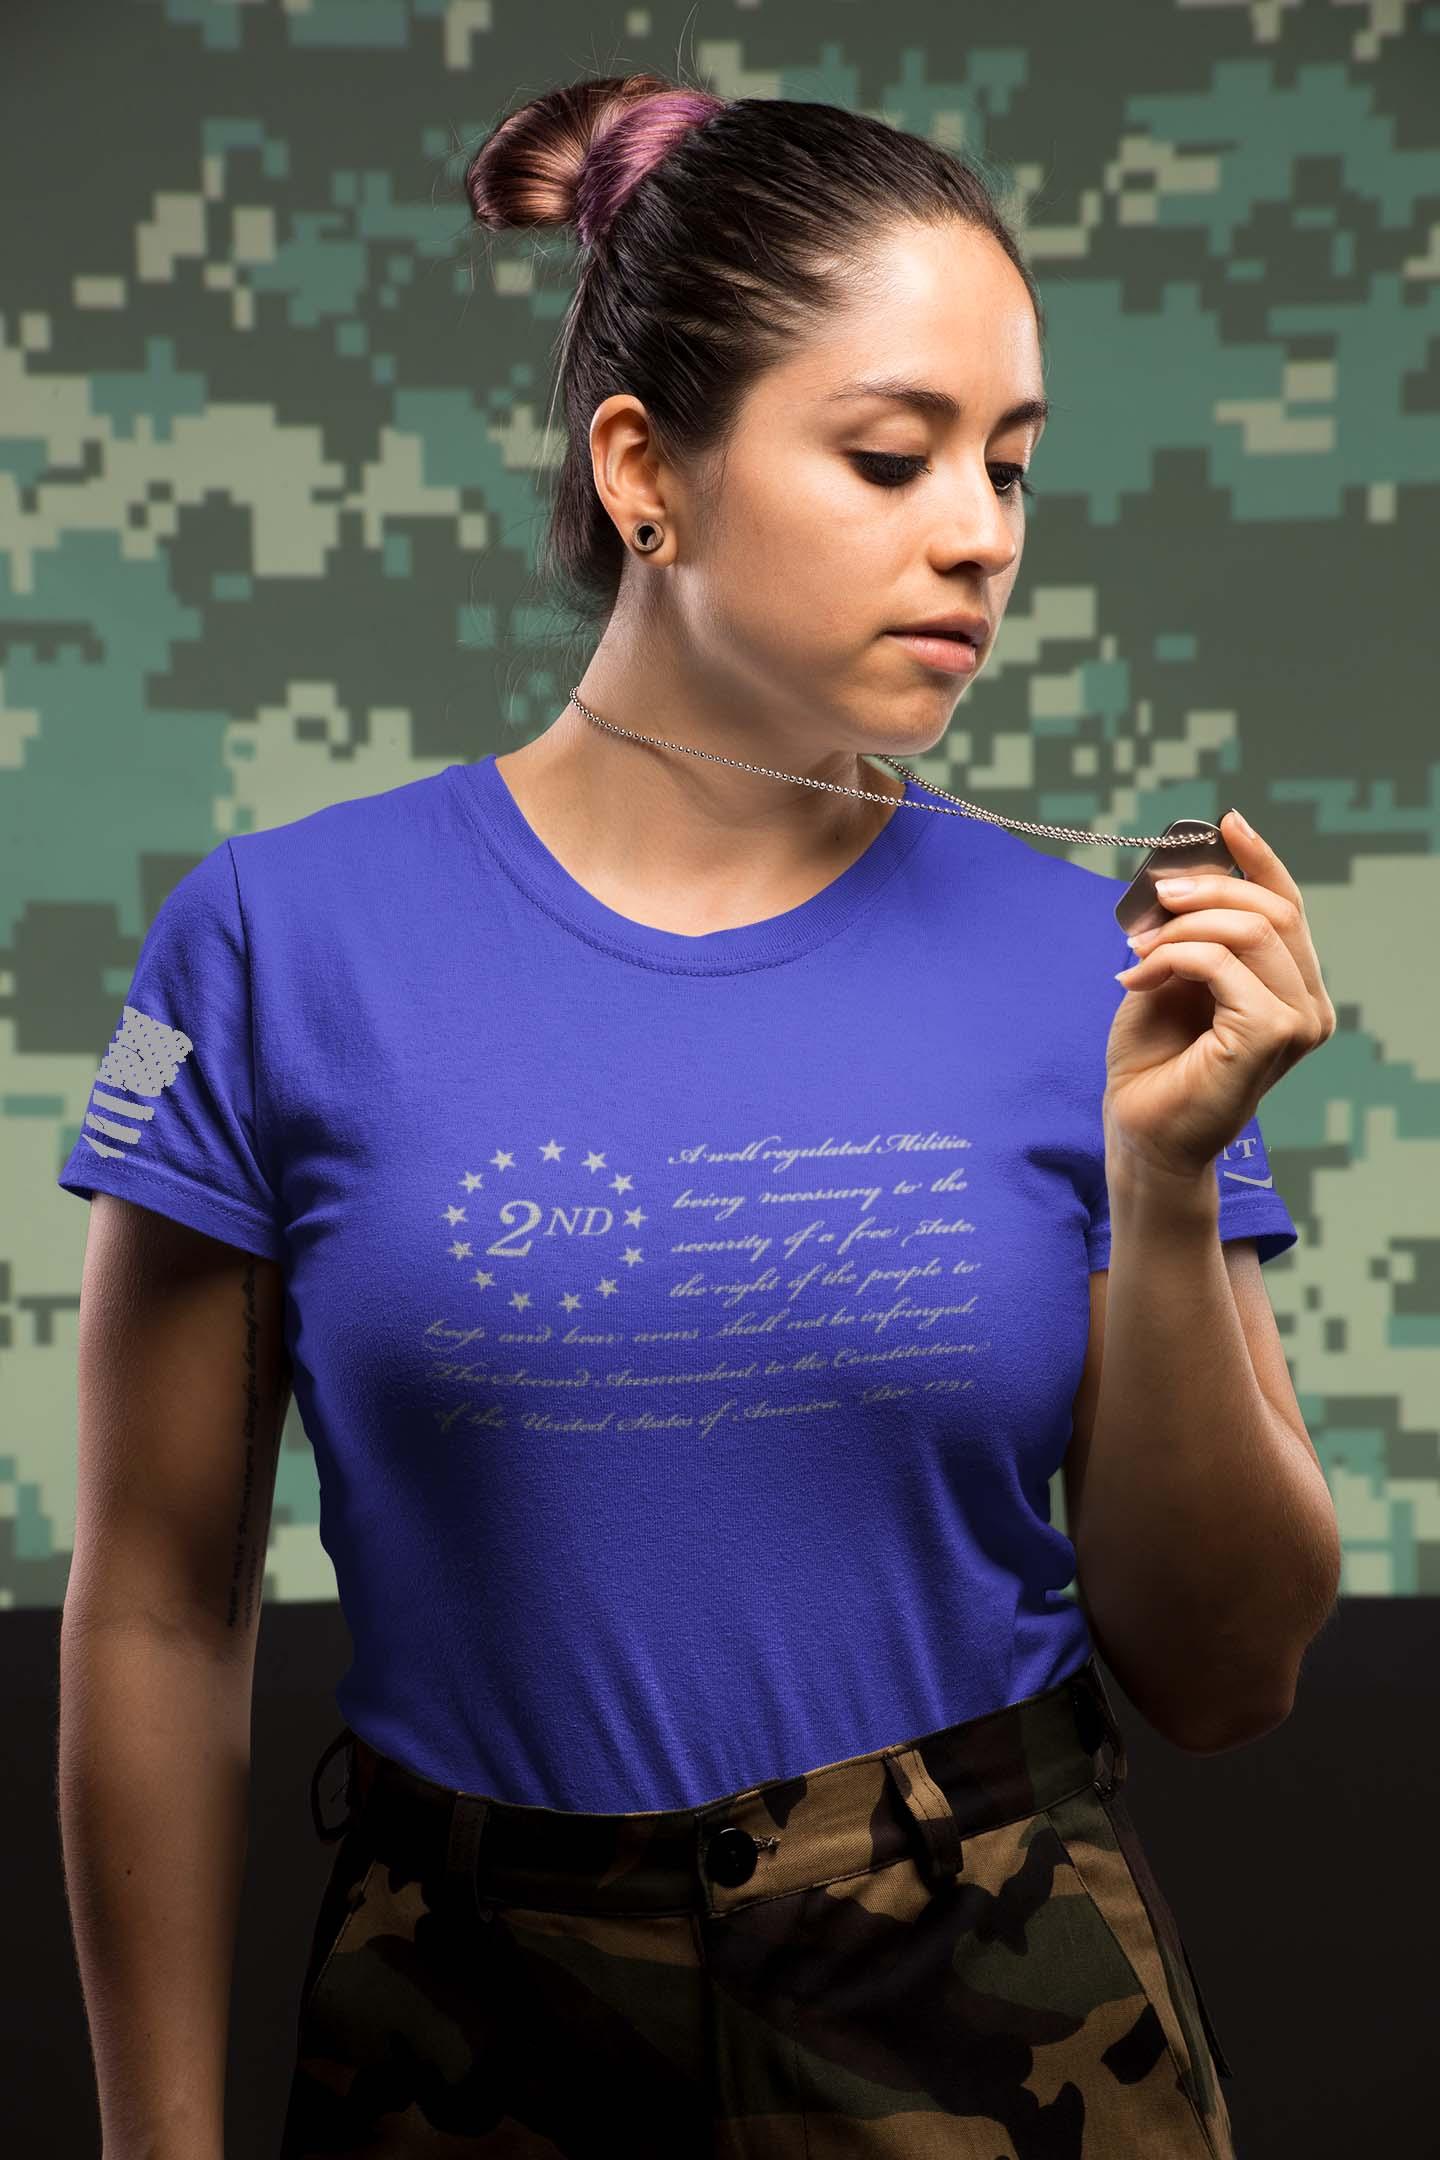 t-shirt - 2nd Amendment on front - Women - Royal